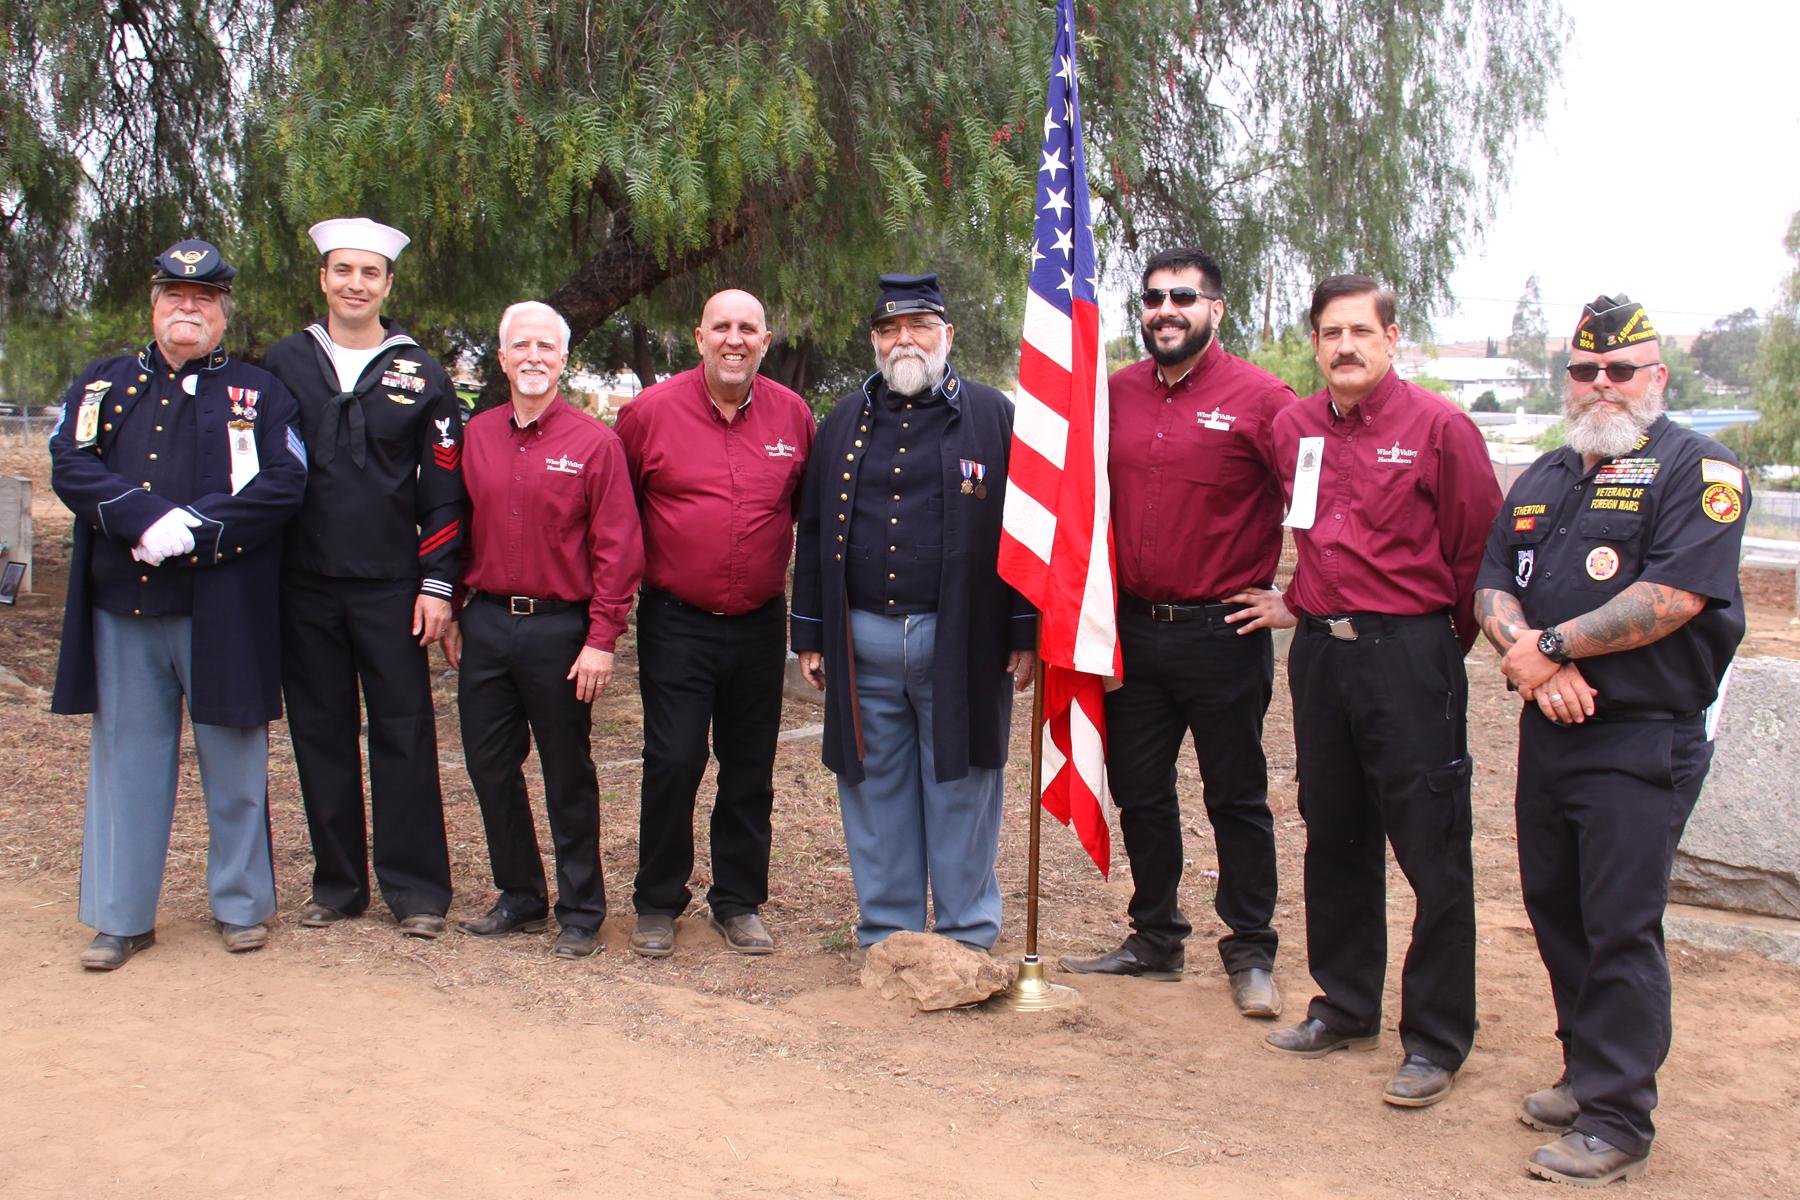 20160528 Odd Fellows Cemetery, Fallbrook, CA (A55).jpg